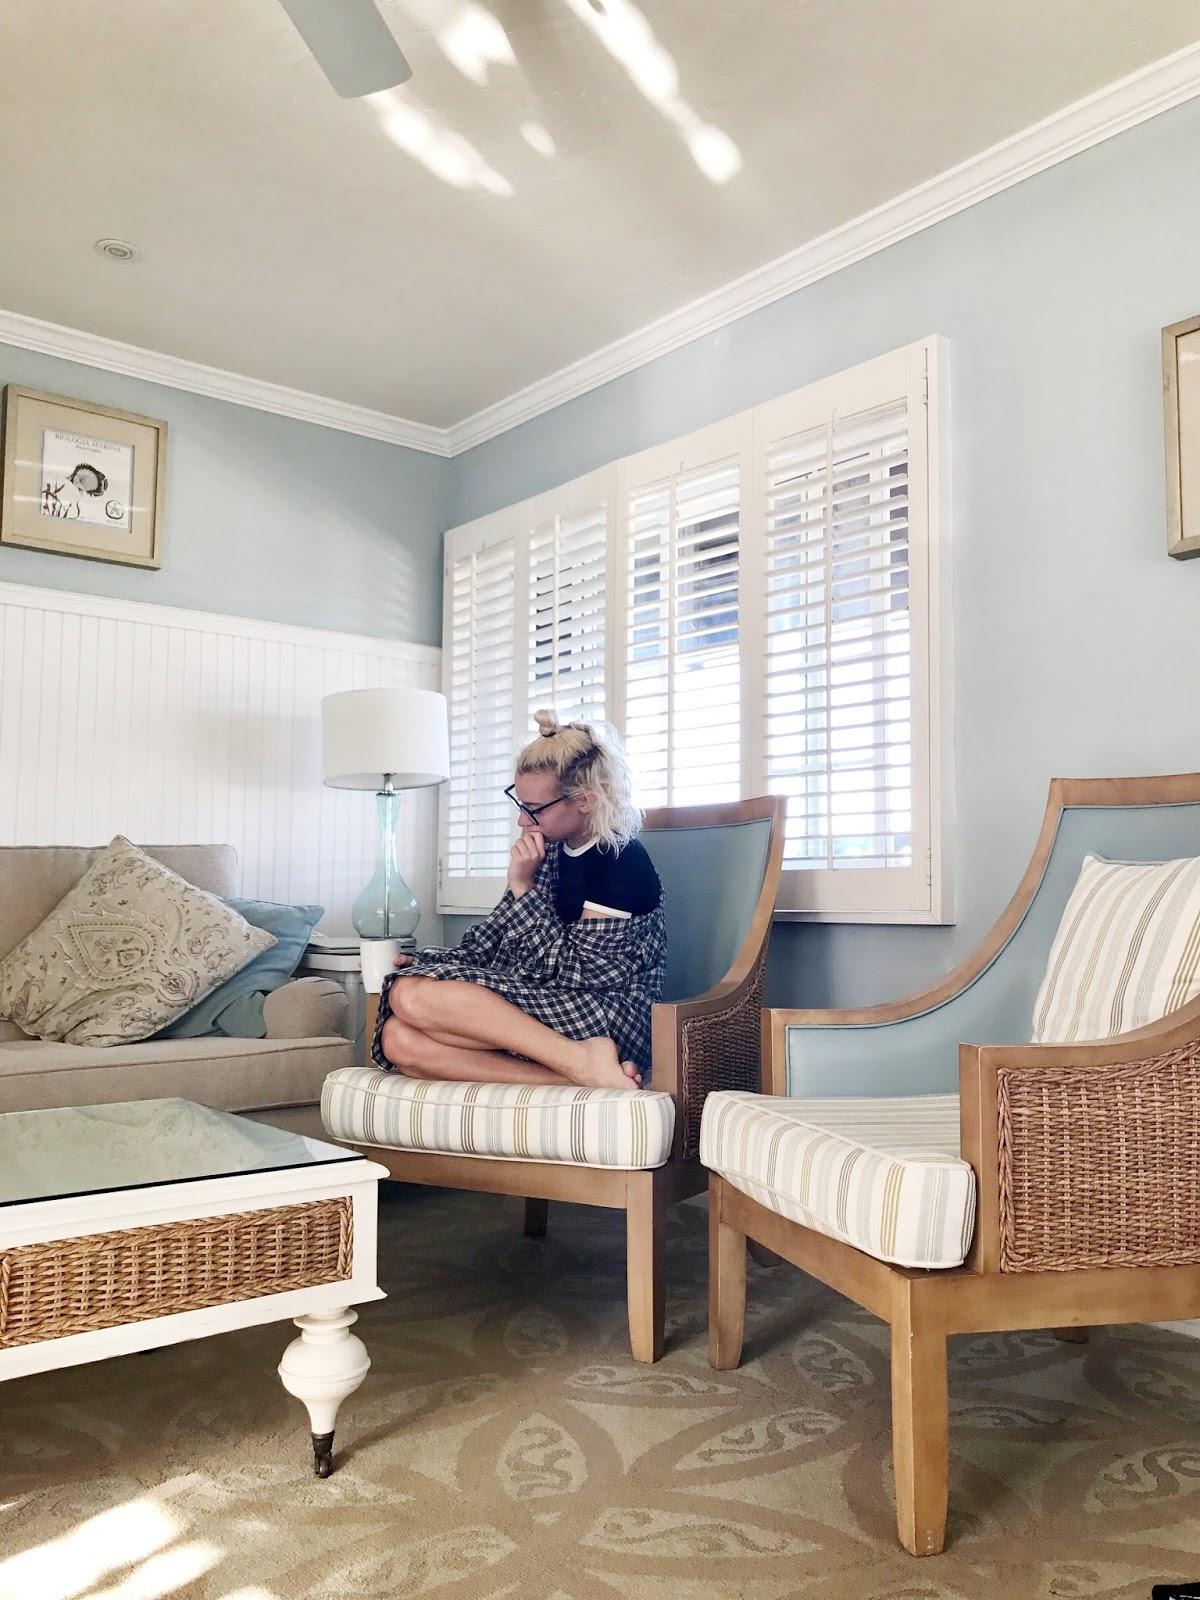 A HOME AWAY FROM HOME: SCRIPPS INN LA JOLLA, SAN DIEGO | ASHLEY UNICORN